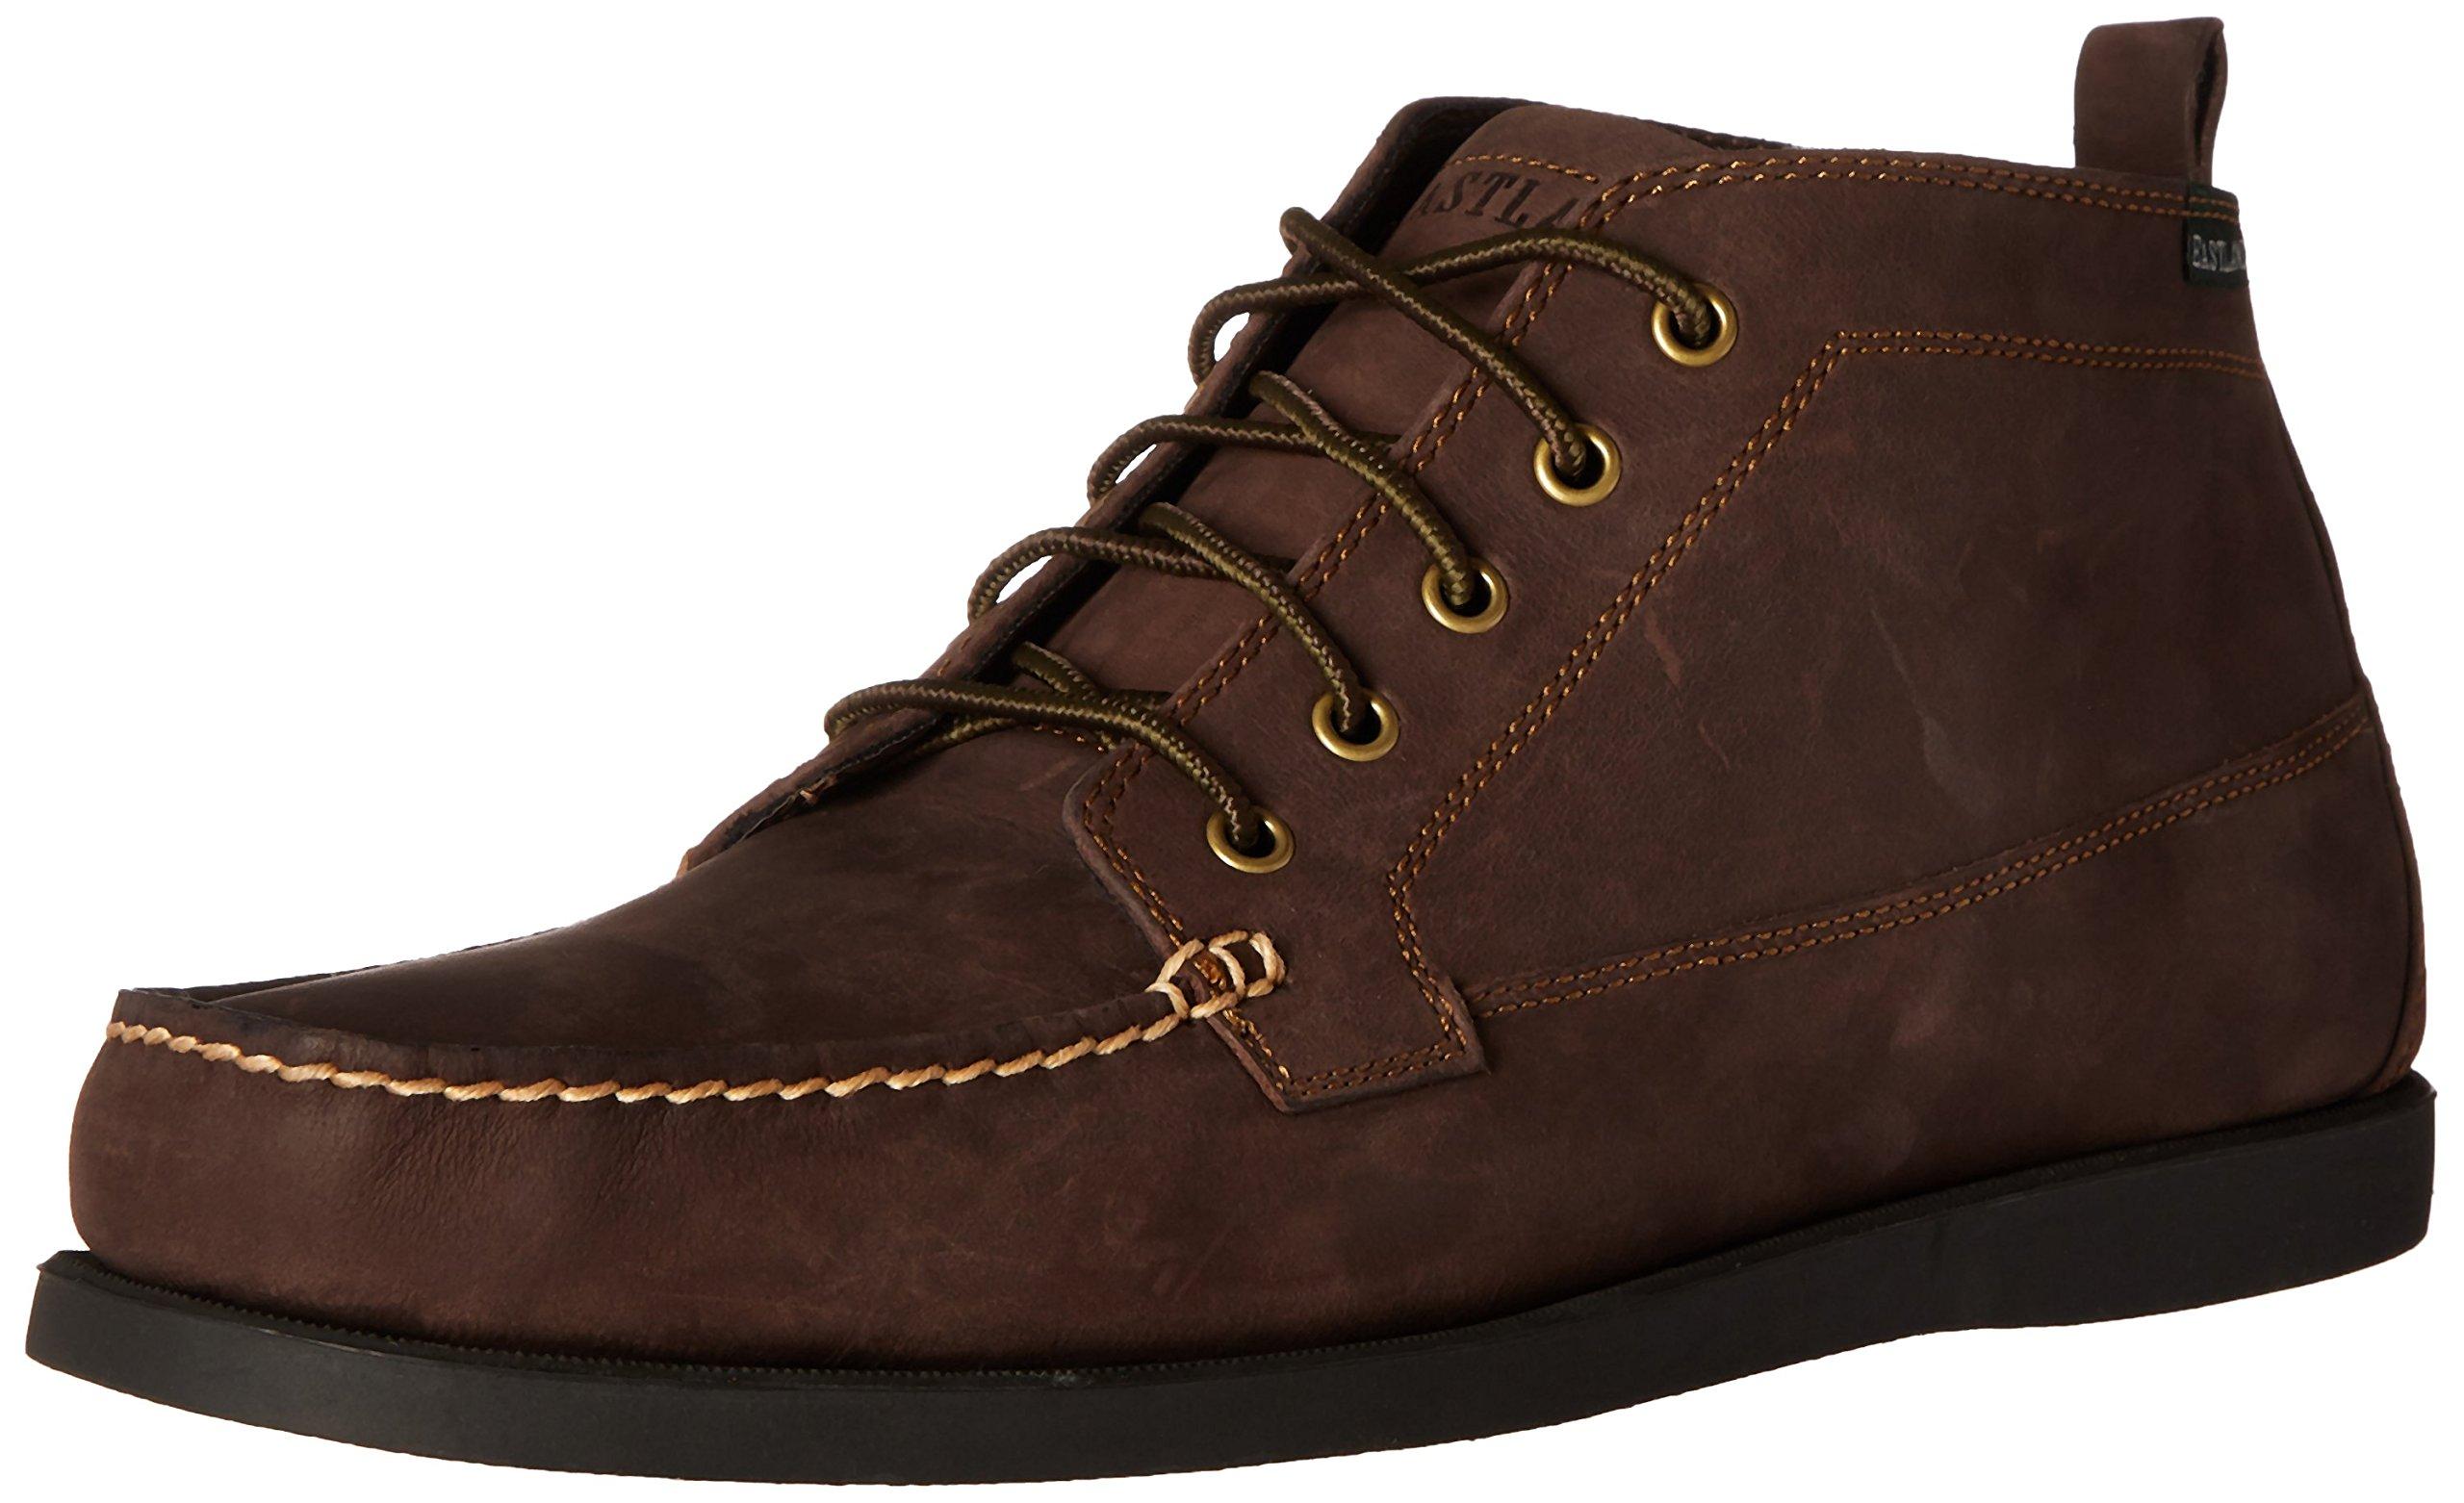 Eastland Men's Seneca Chukka Boot, Bomber Brown, 14 D US